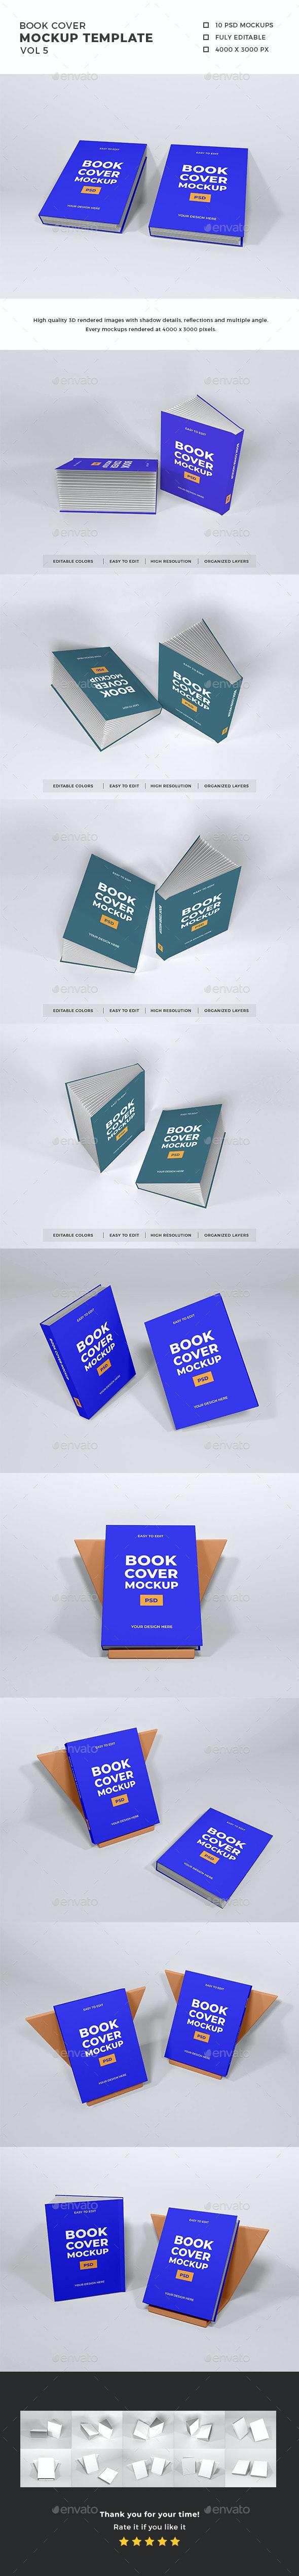 Book Cover Mockup Template Vol 5 - Books Print